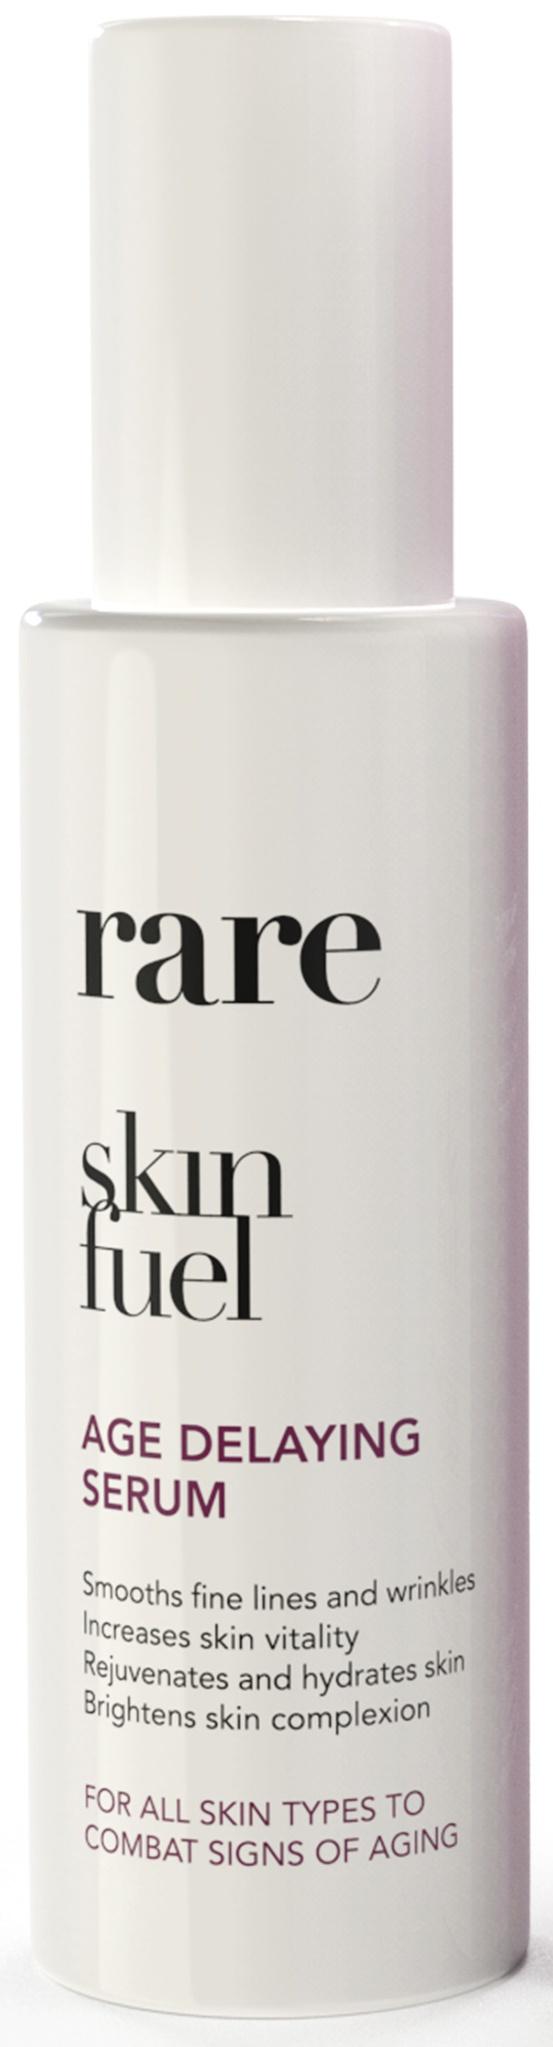 RARE SkinFuel Age Delaying Serum